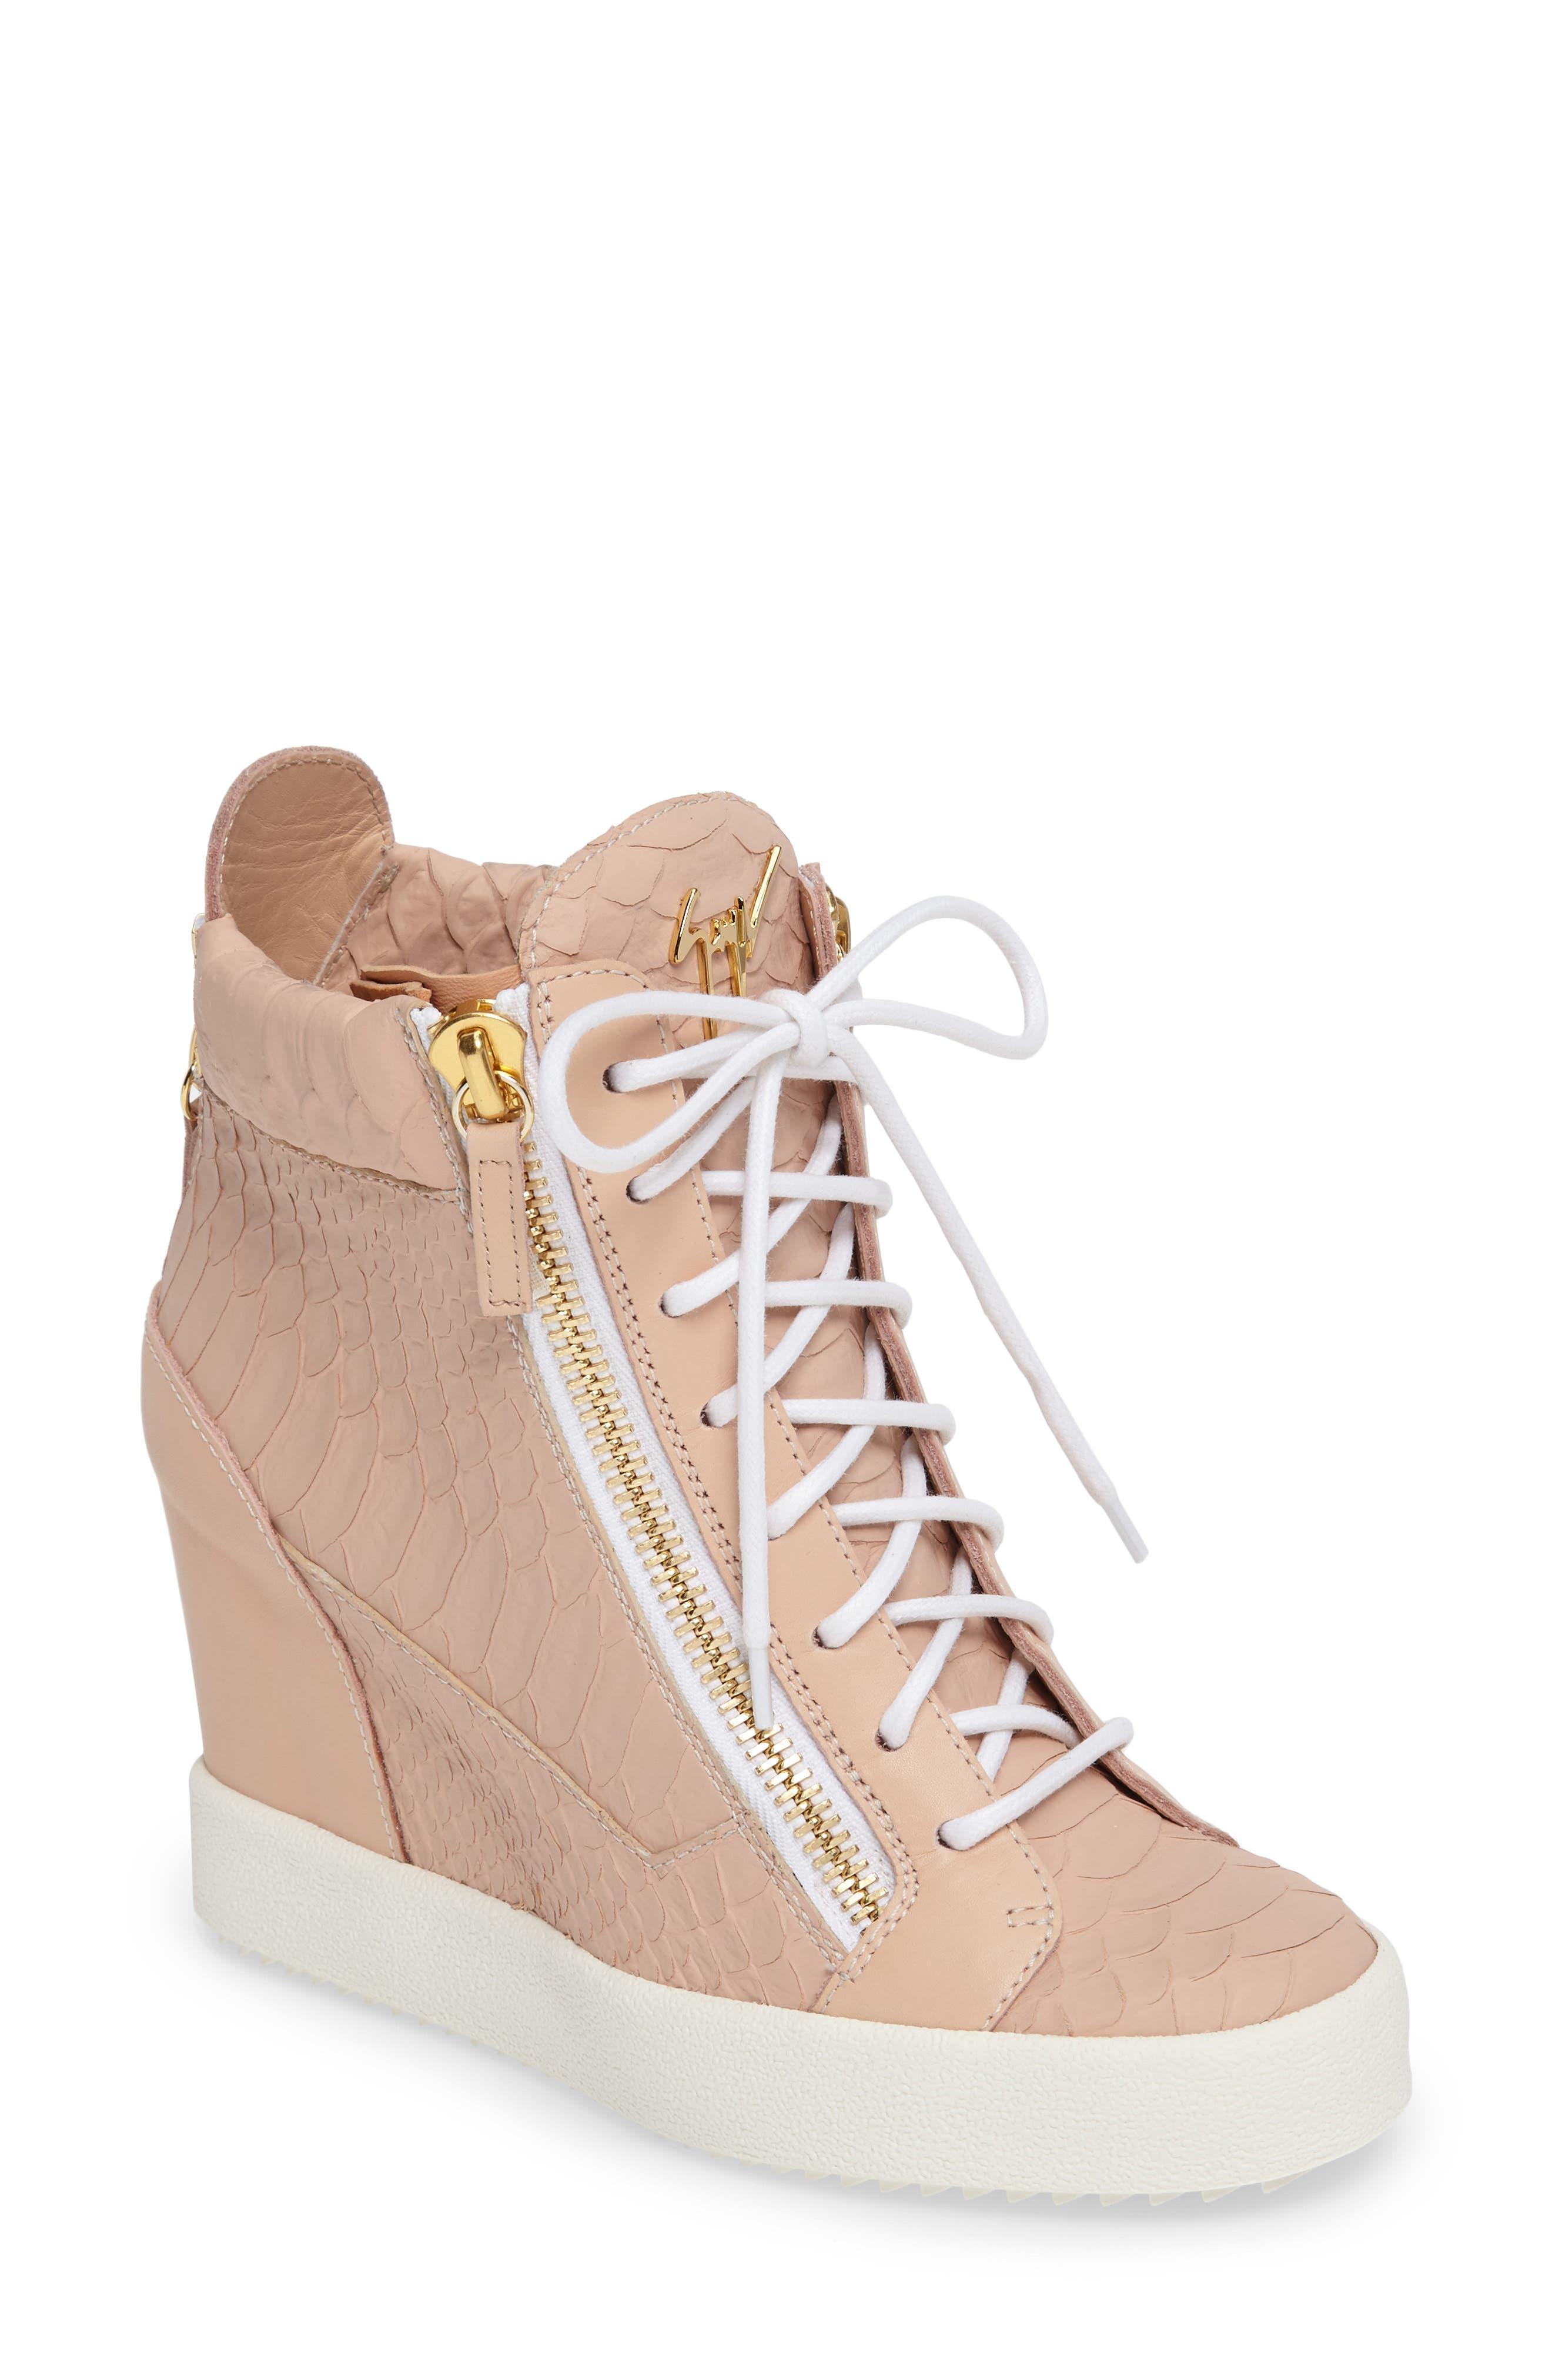 GIUSEPPE ZANOTTI | Ofelia Wedge Sneaker